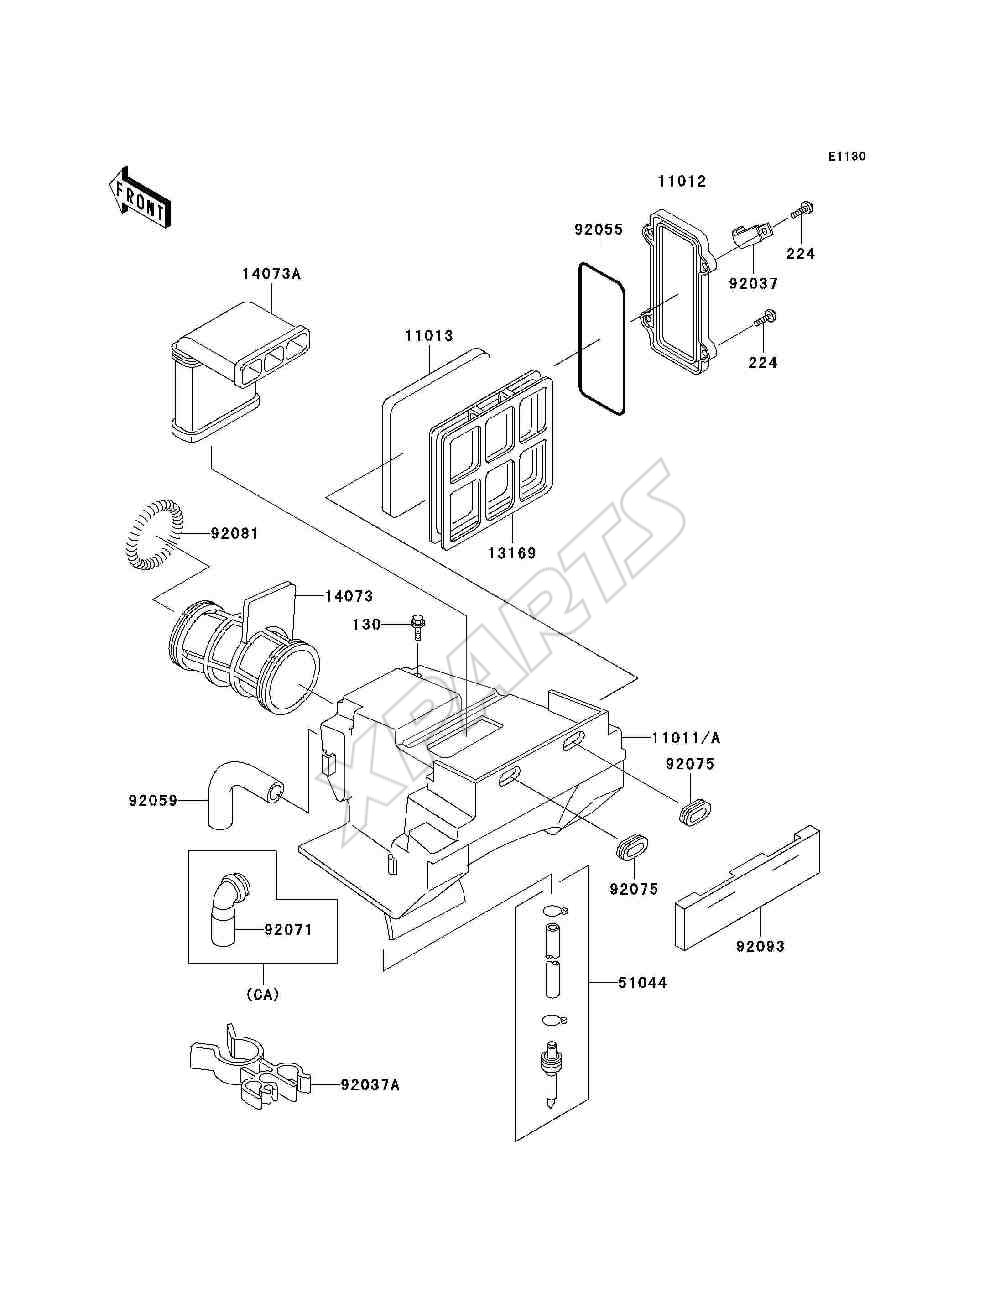 2002 klr 250 wiring diagram